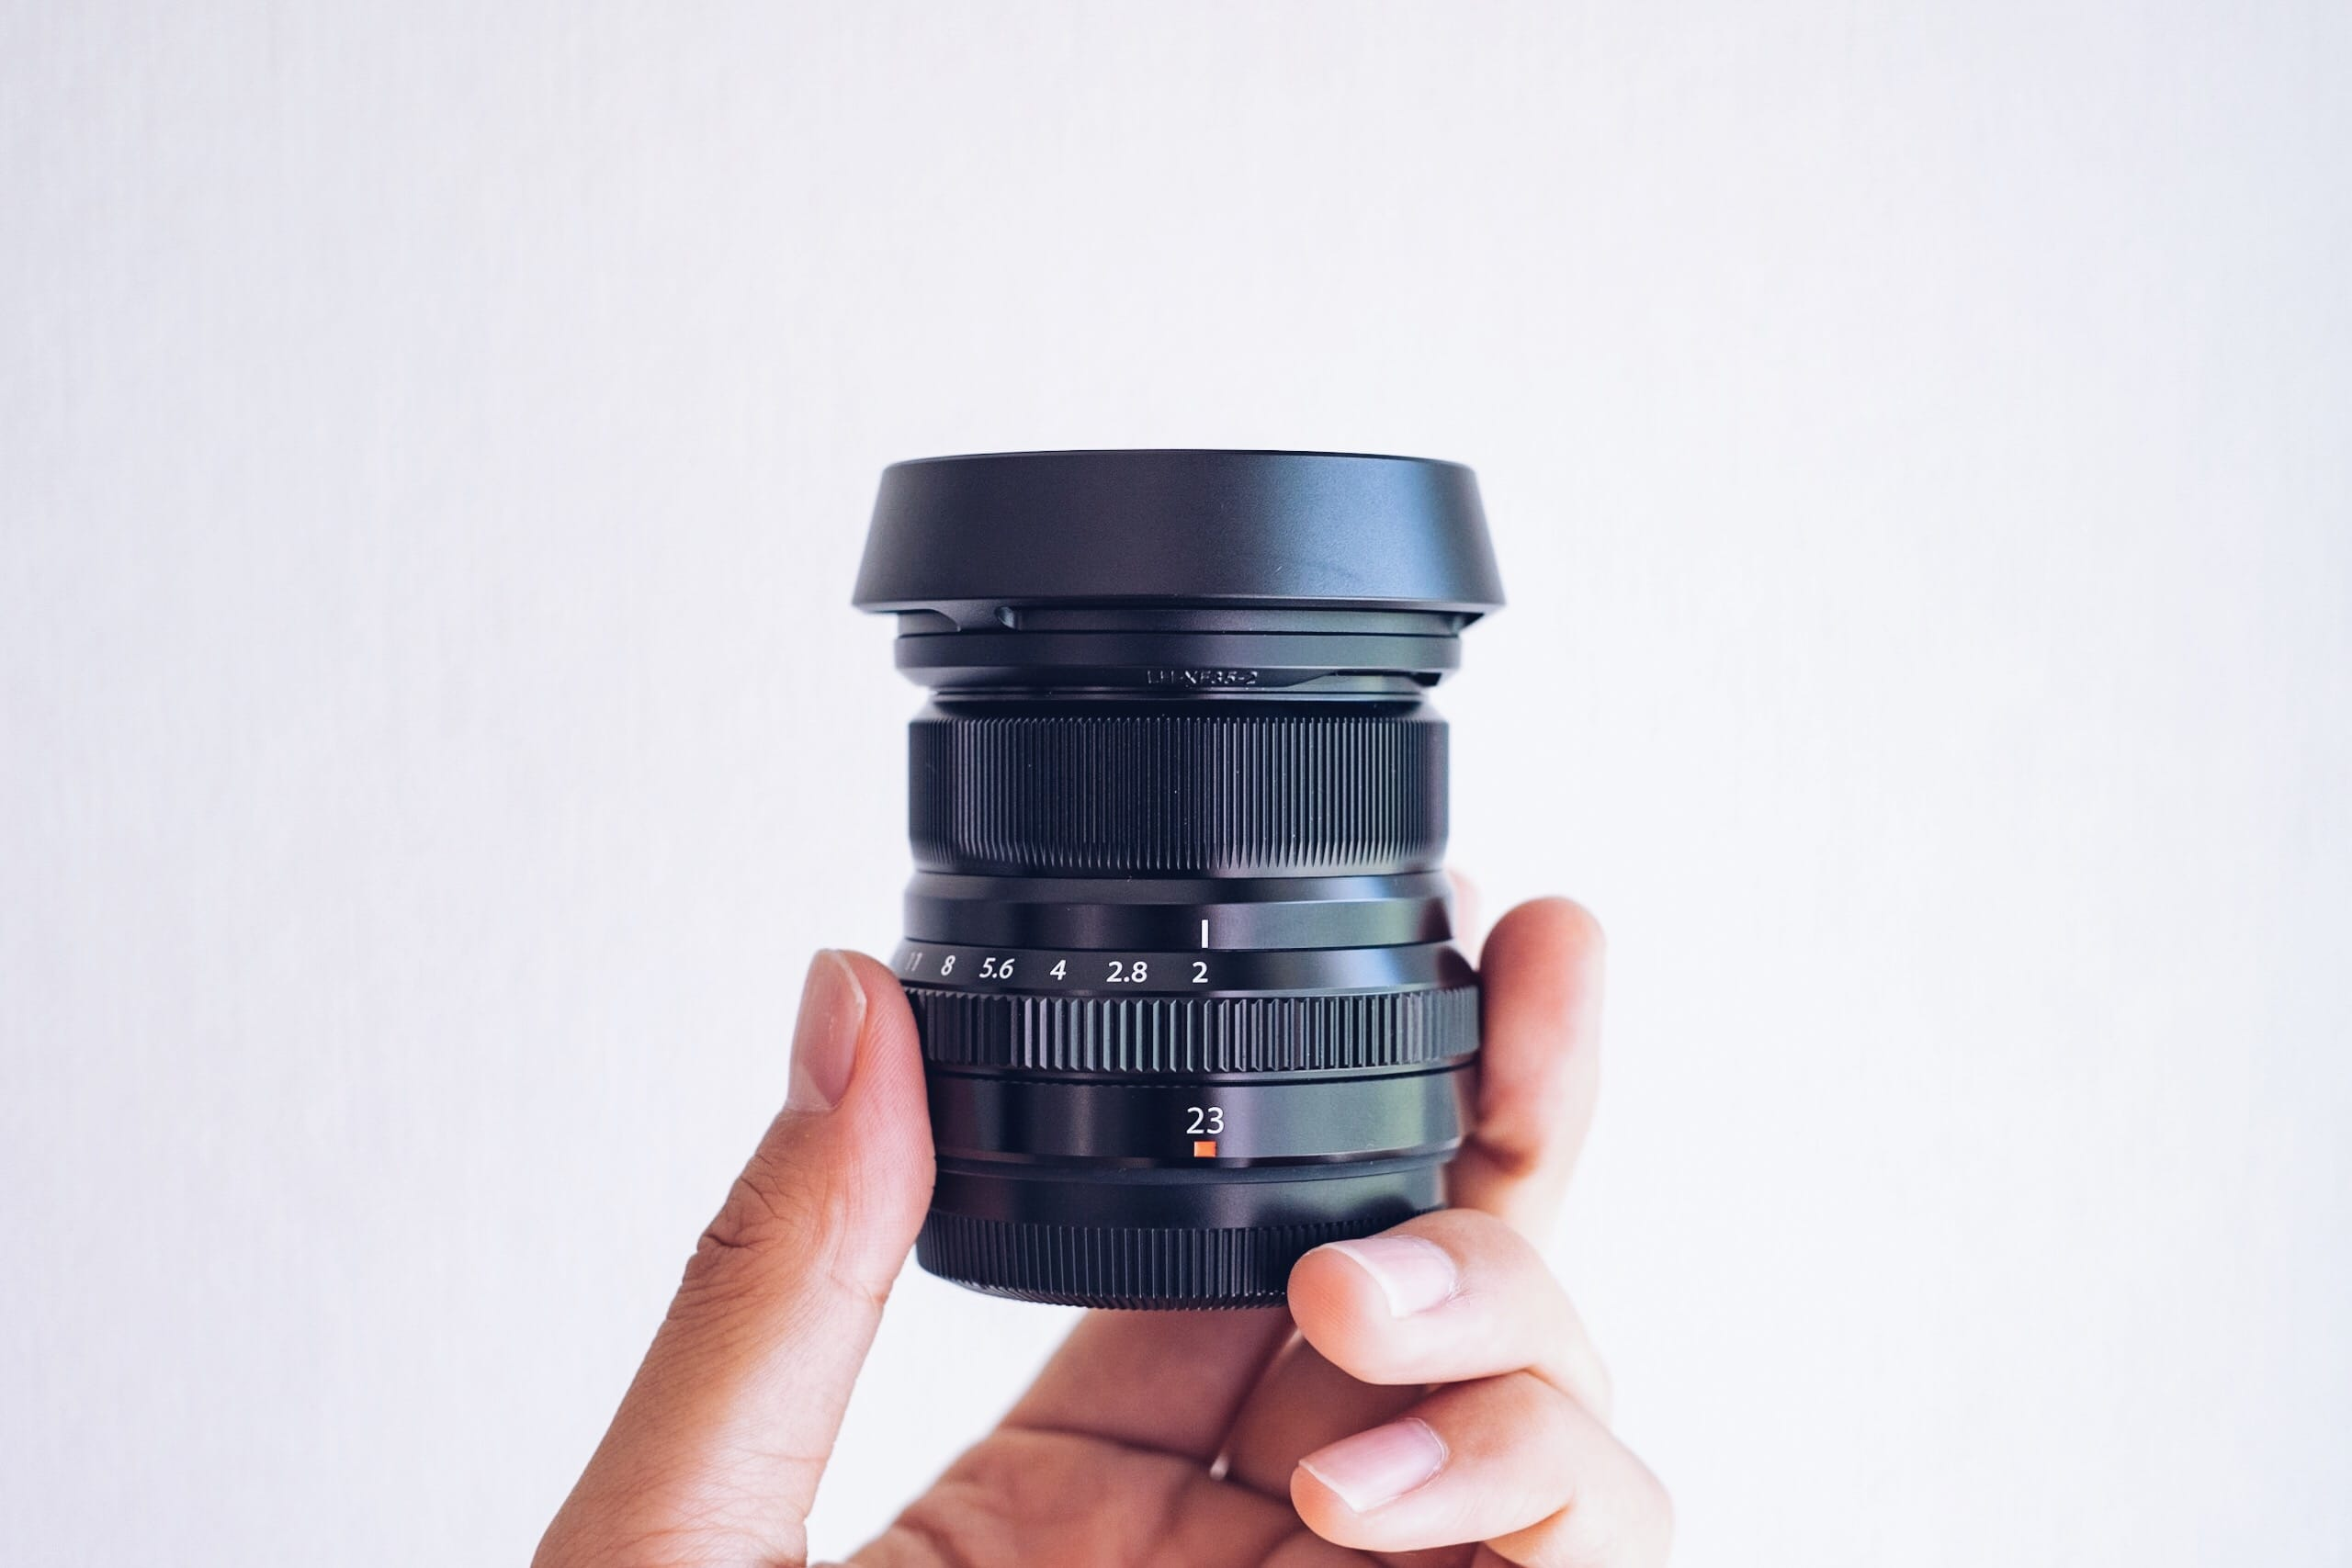 FUJIFILM XF23mm F2 R WR 1年使用レビュー。小さく軽く、テンポよく撮れる単焦点レンズ【作例あり】